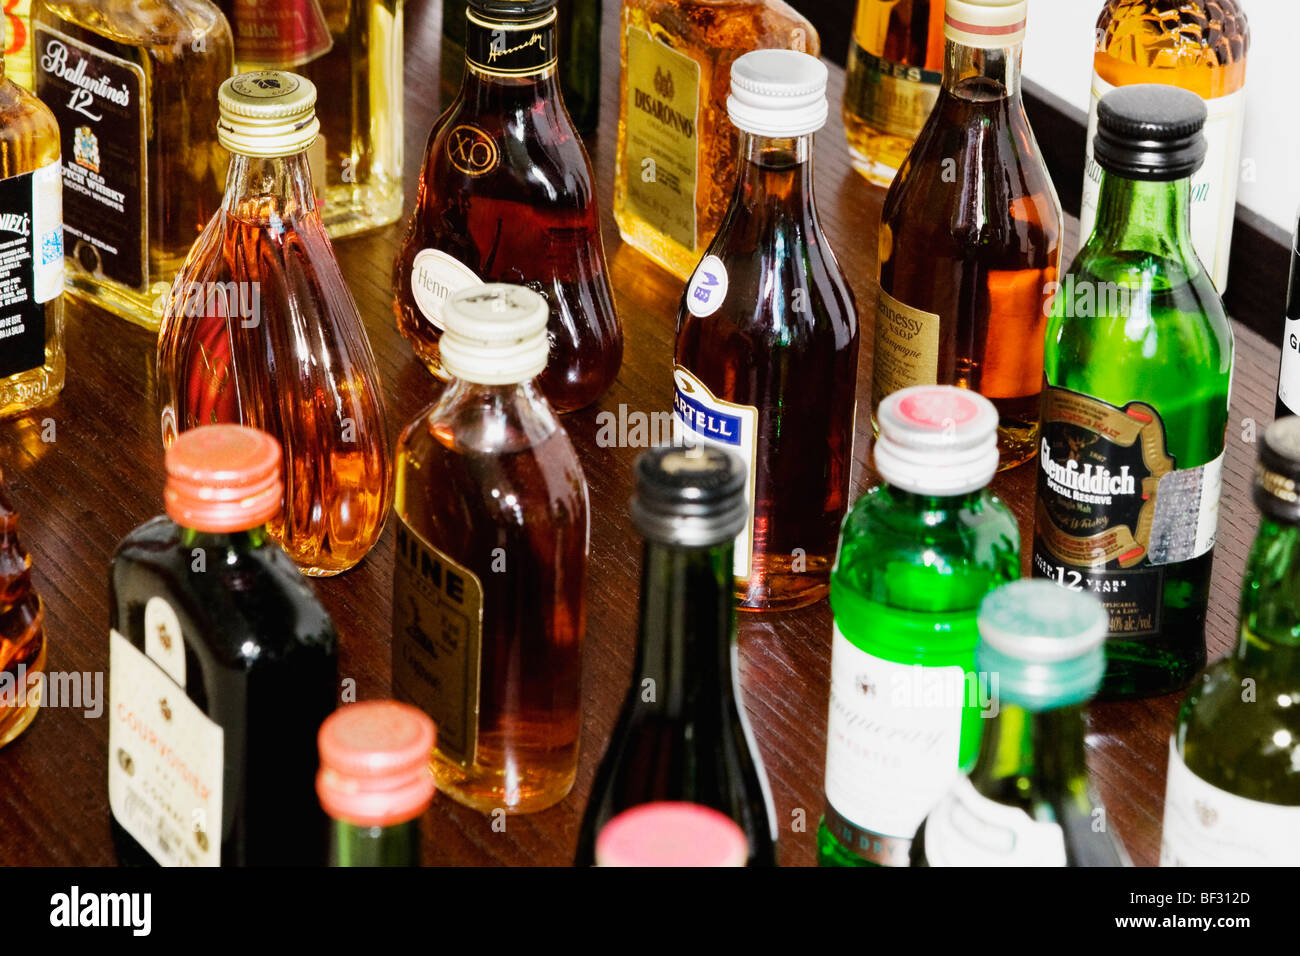 Varieties of alcoholic bottles - Stock Image